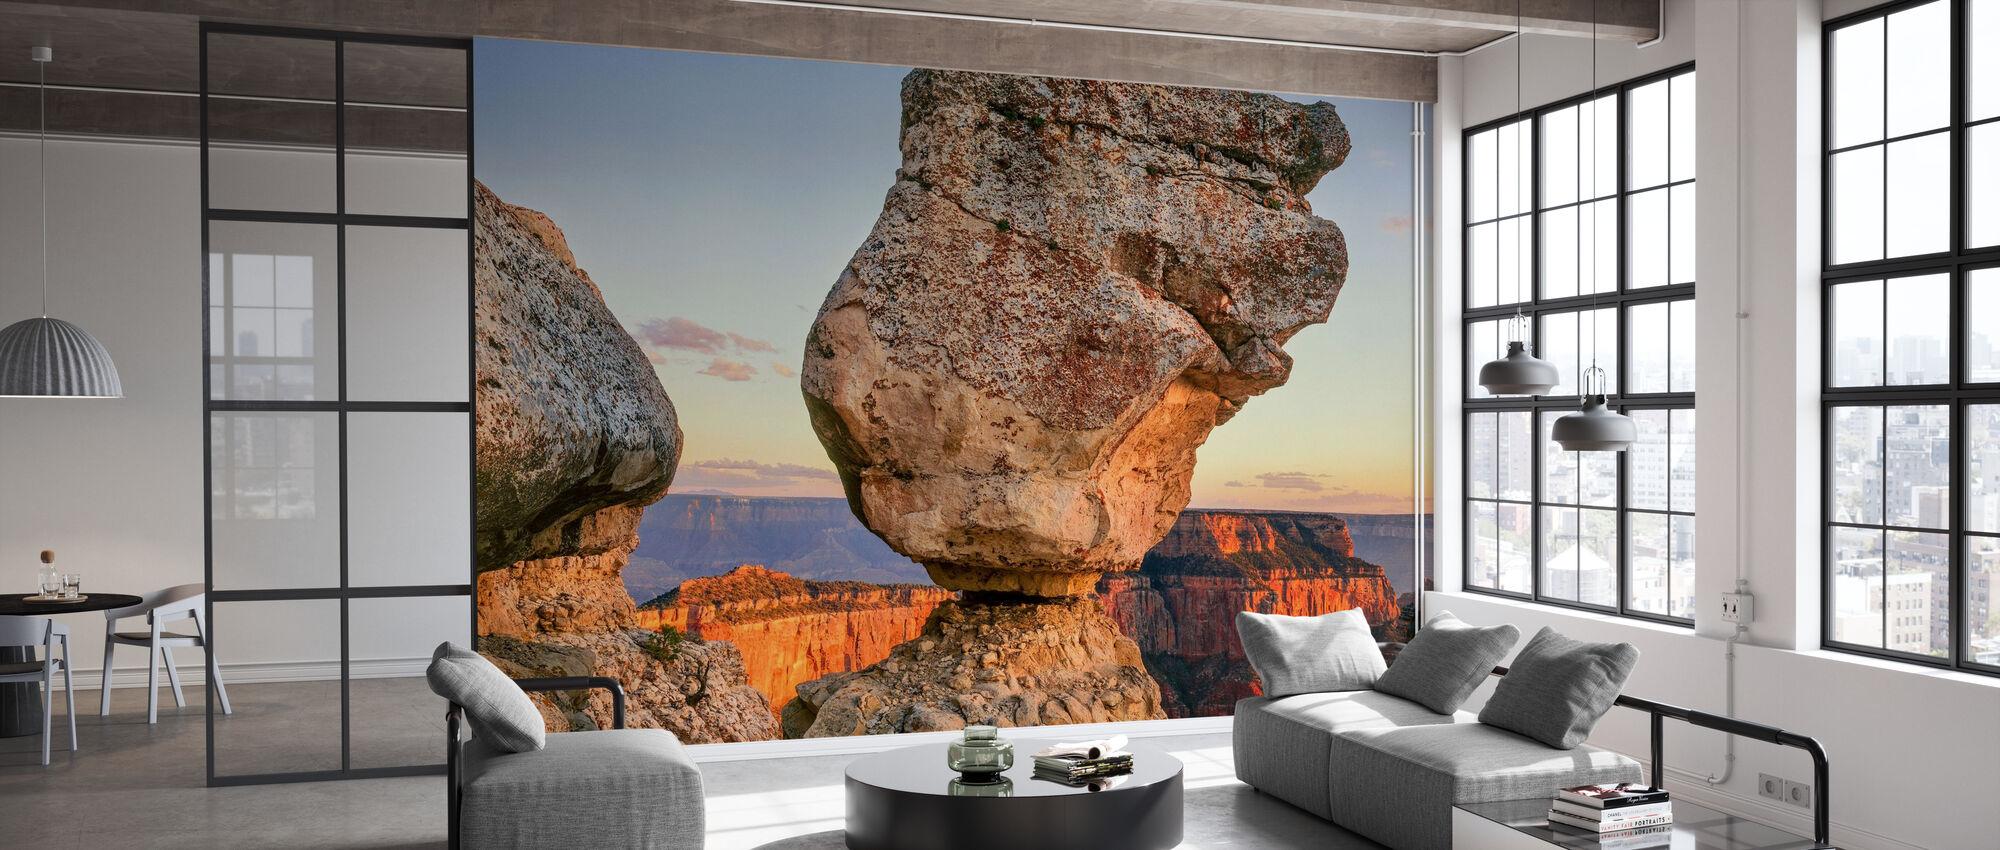 Balanced Rock at Sunset - Wallpaper - Office